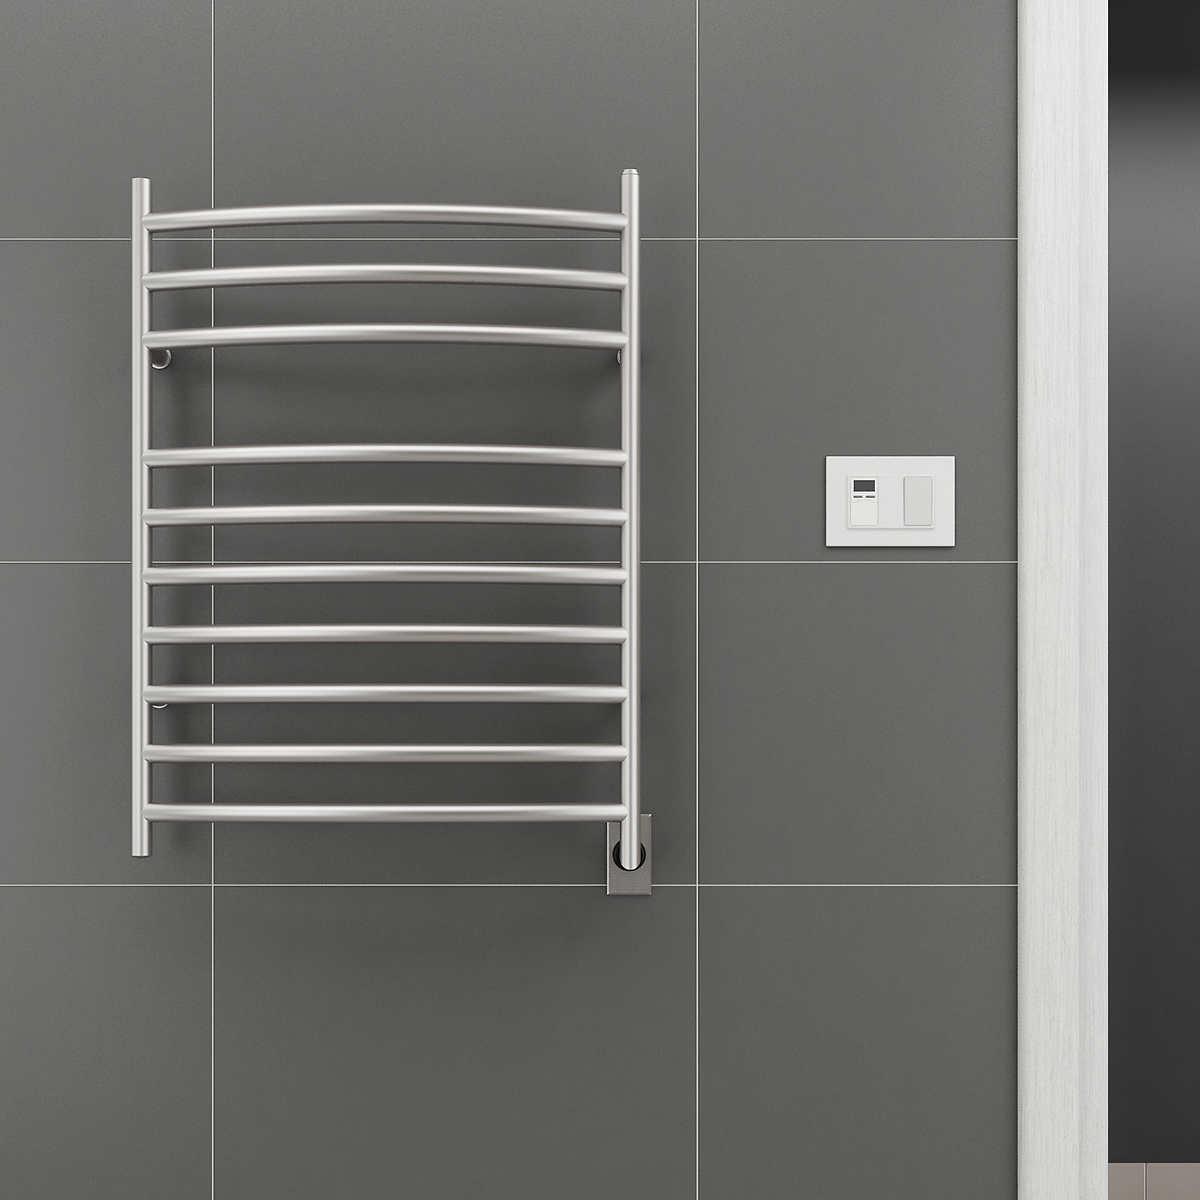 Bathroom towel heaters - Ancona Comfort 10s Electric Towel Warmer And Drying Rack